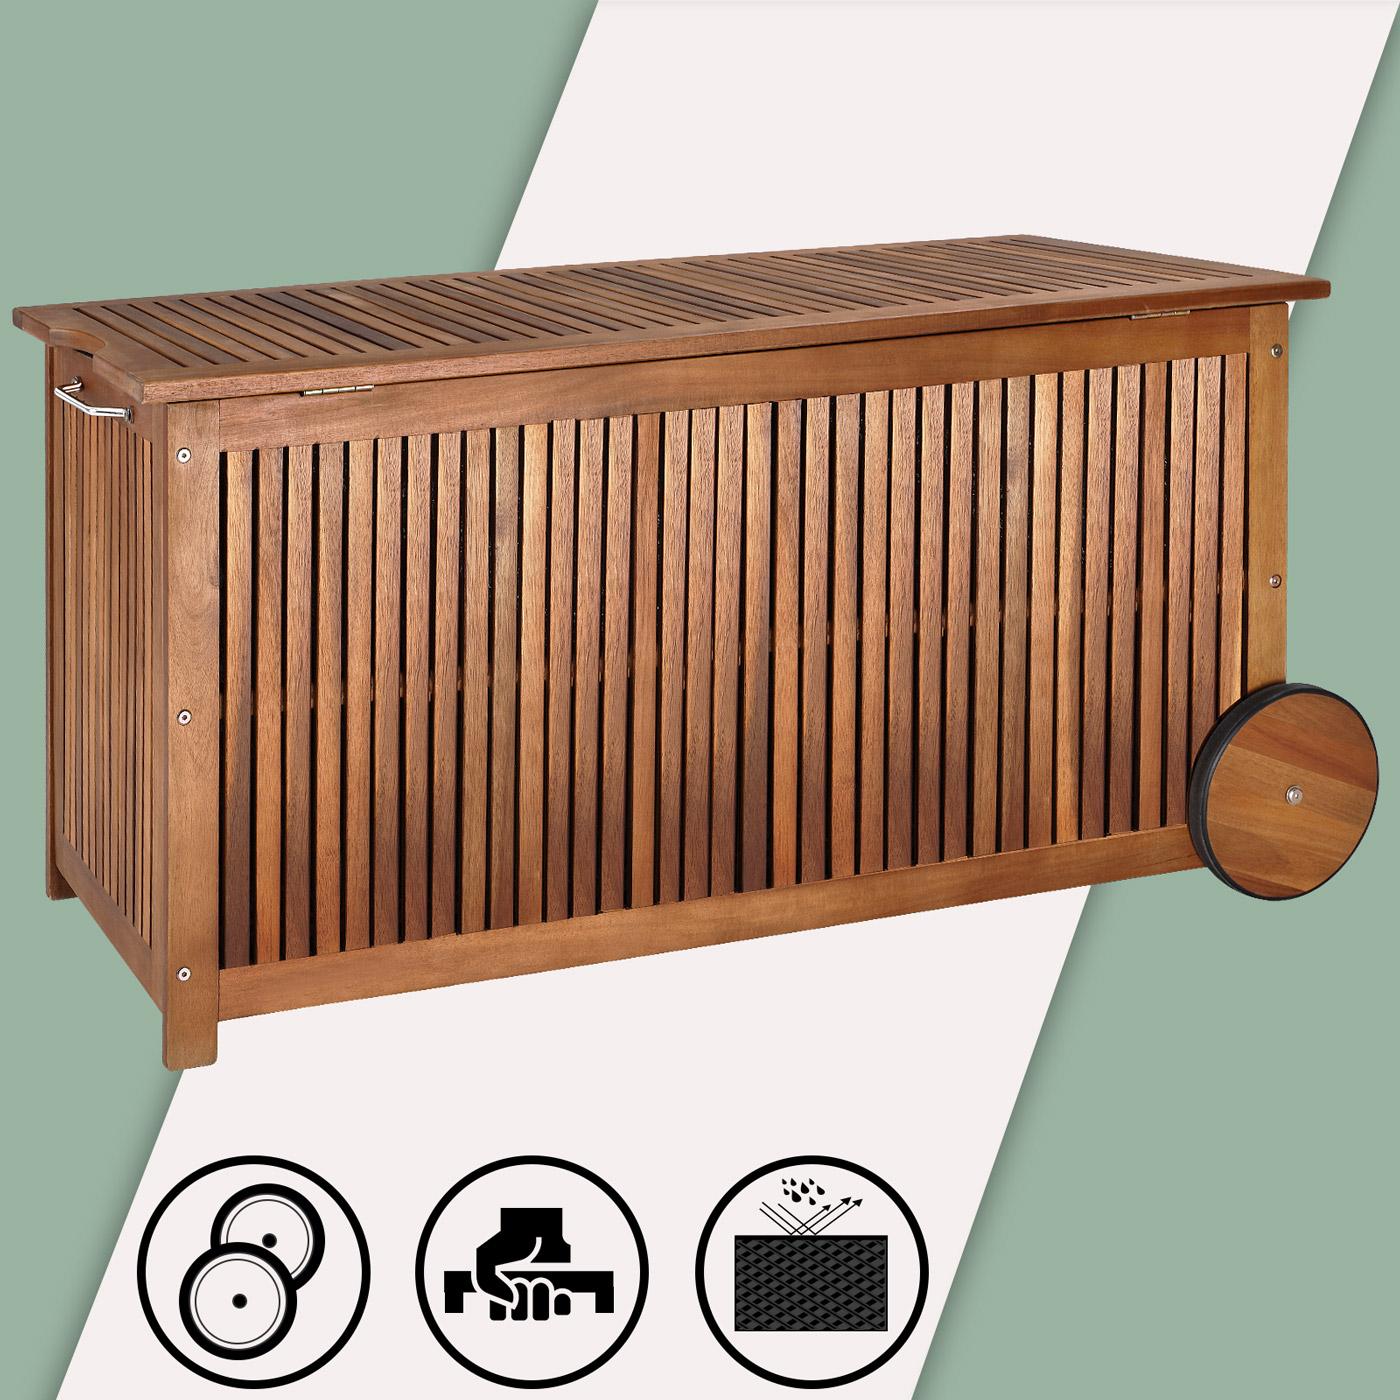 ergonomic sun lounger wooden garden sauna deck chair day. Black Bedroom Furniture Sets. Home Design Ideas